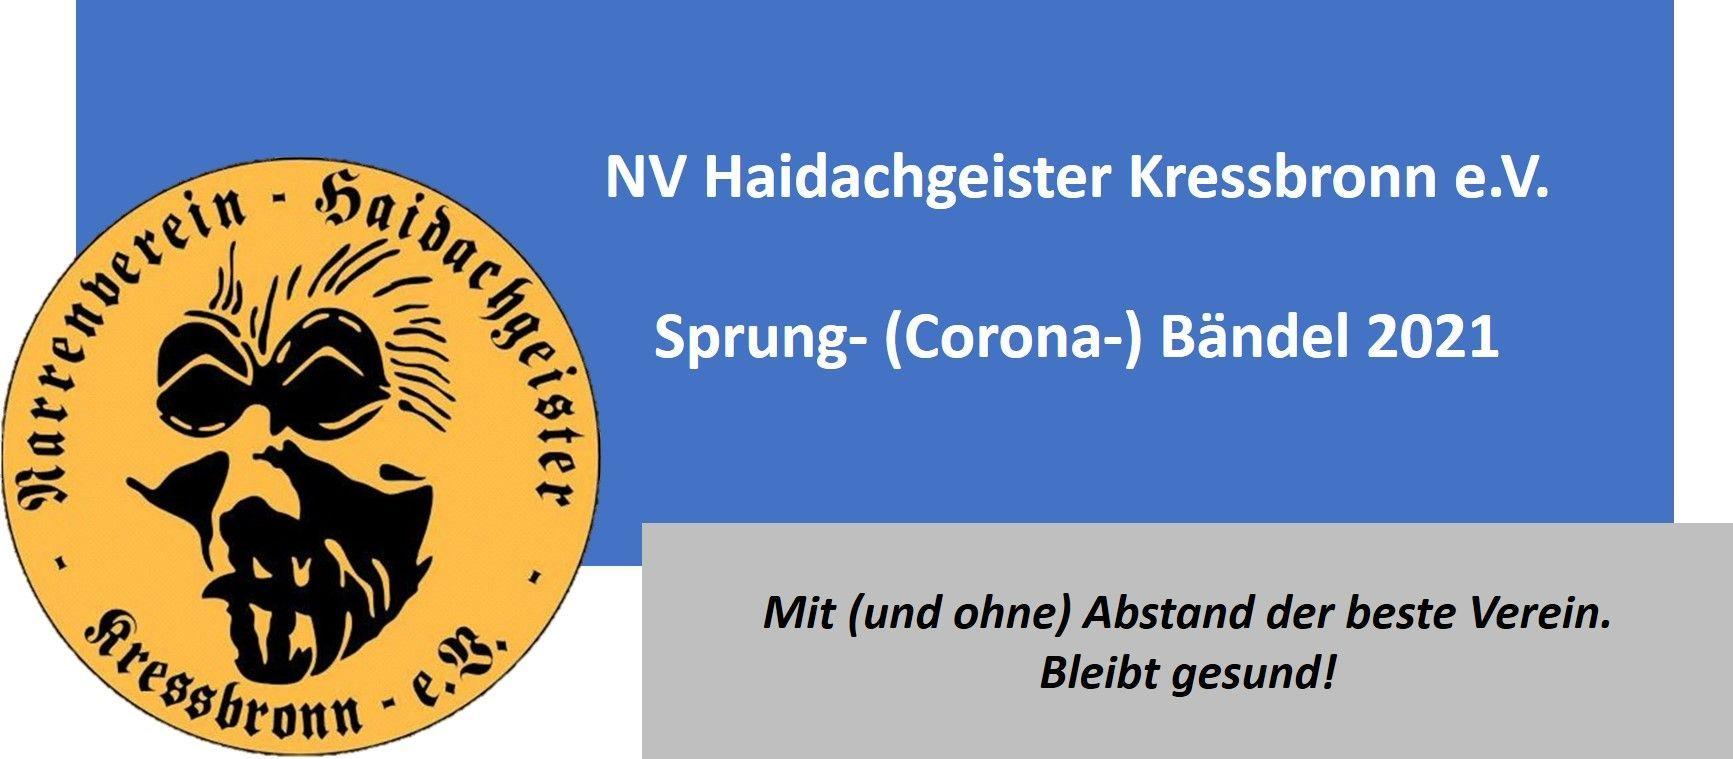 Downloads | N .V . Haidachgeister e.V. Kressbronn